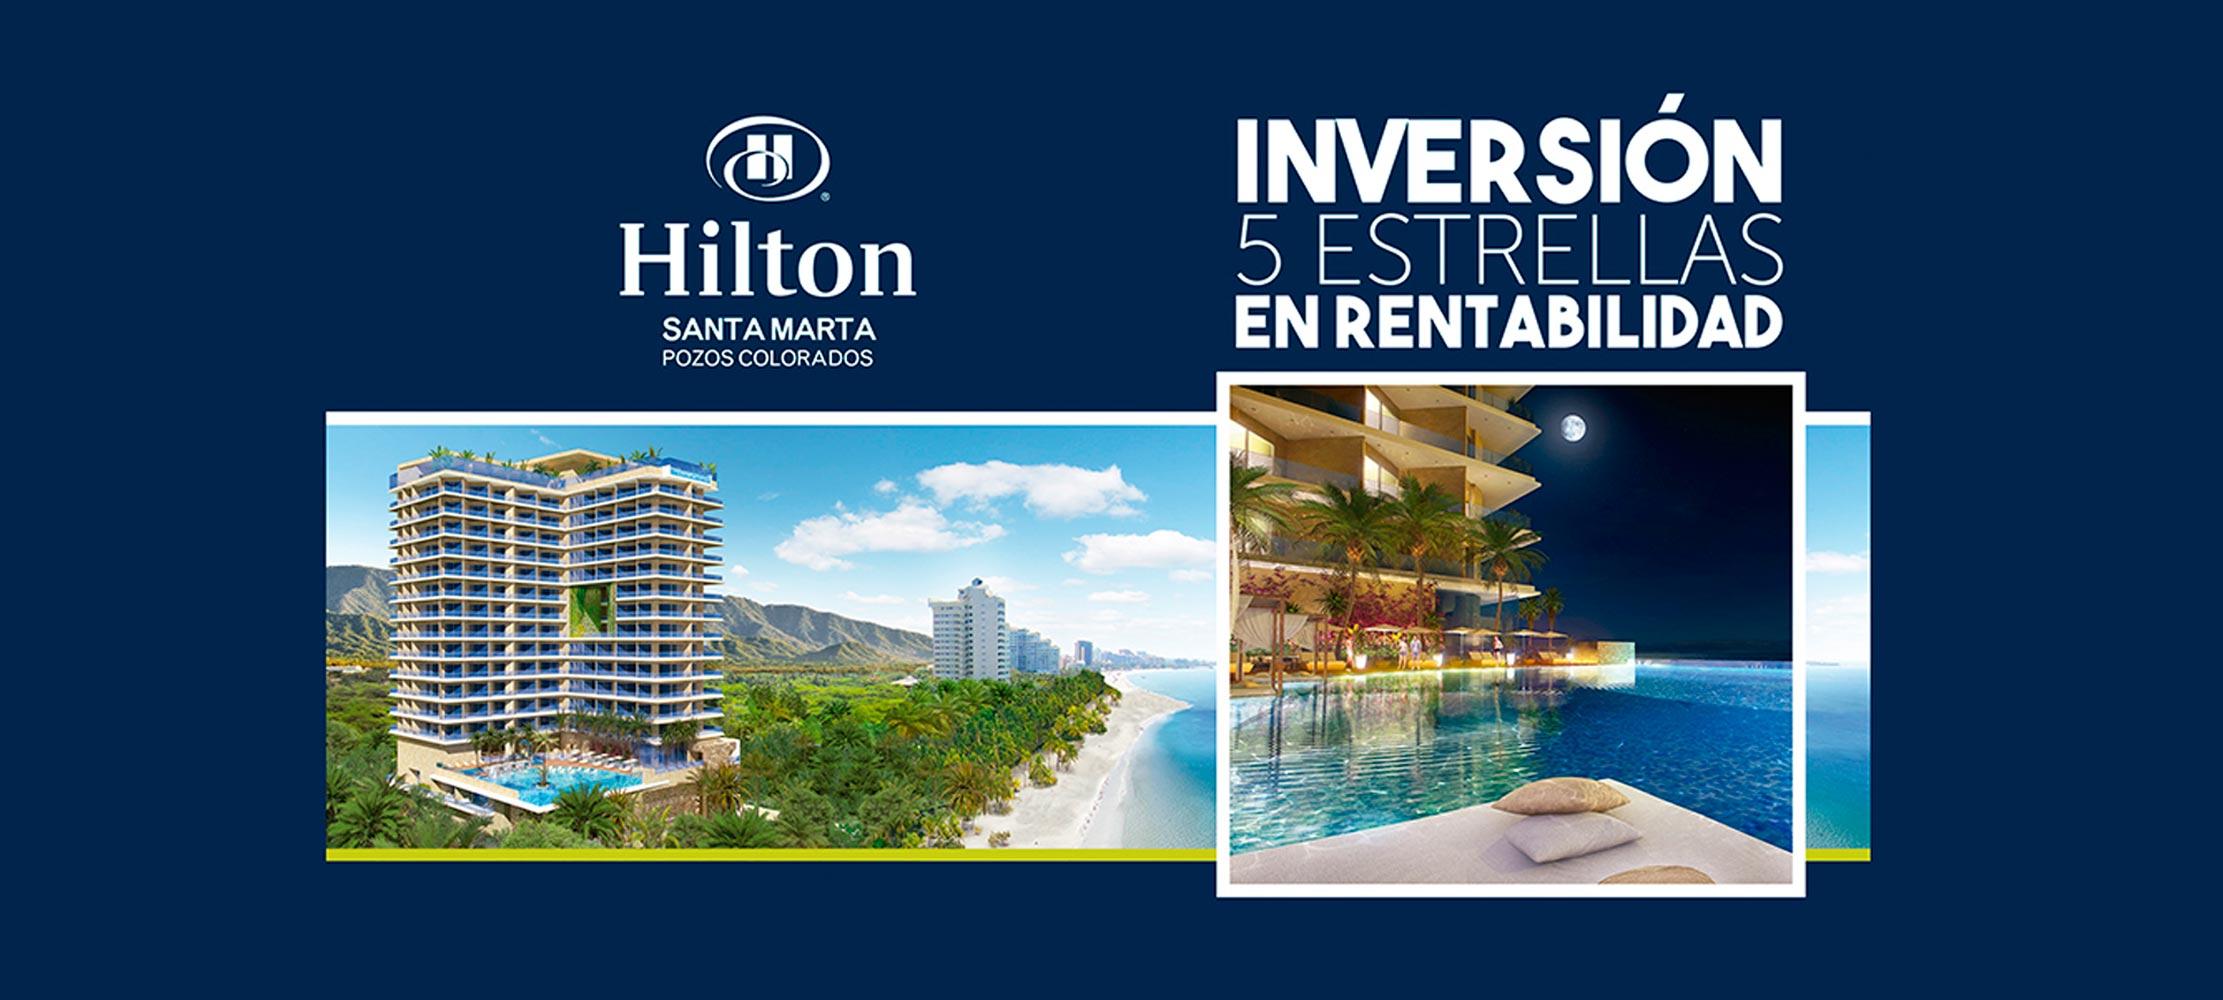 hotel-hilton-santa-martha